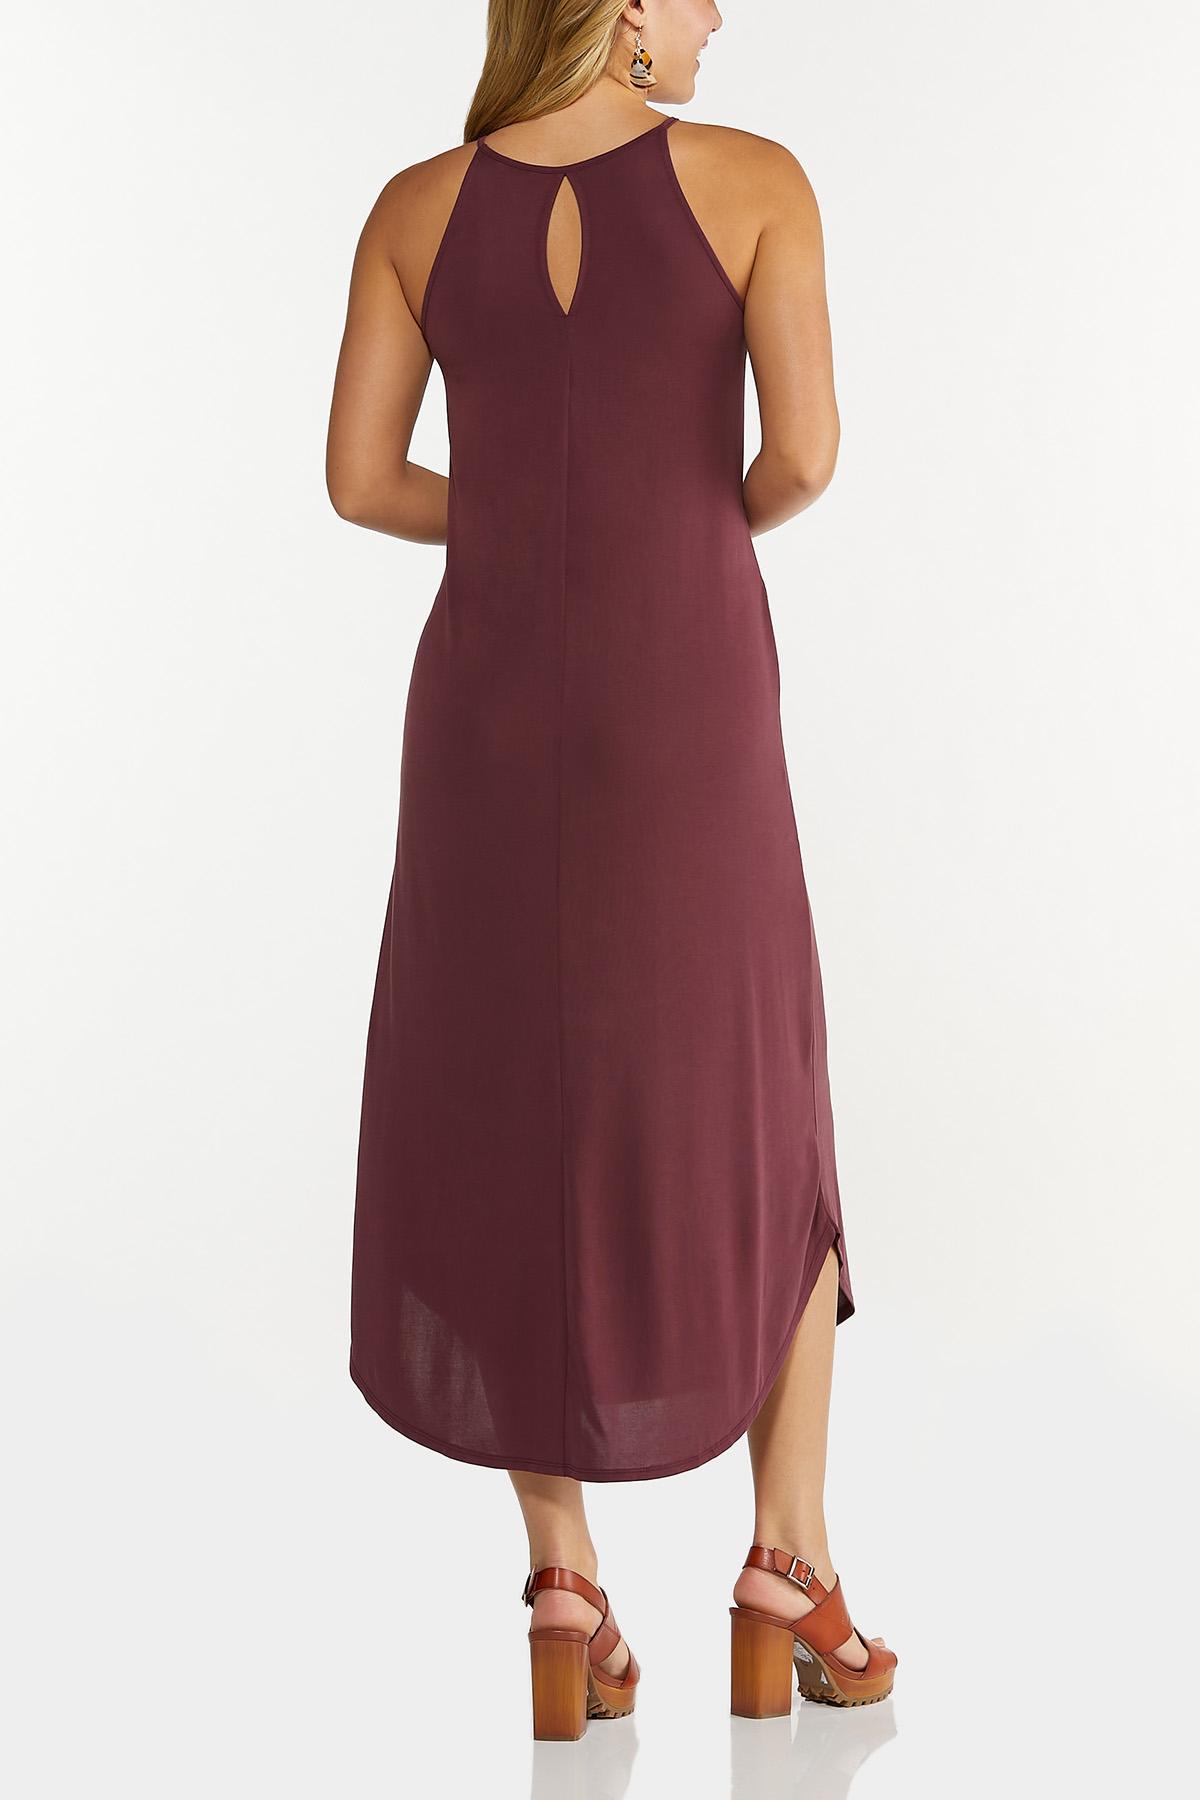 Plus Size Curved Hem Midi Dress (Item #44633452)